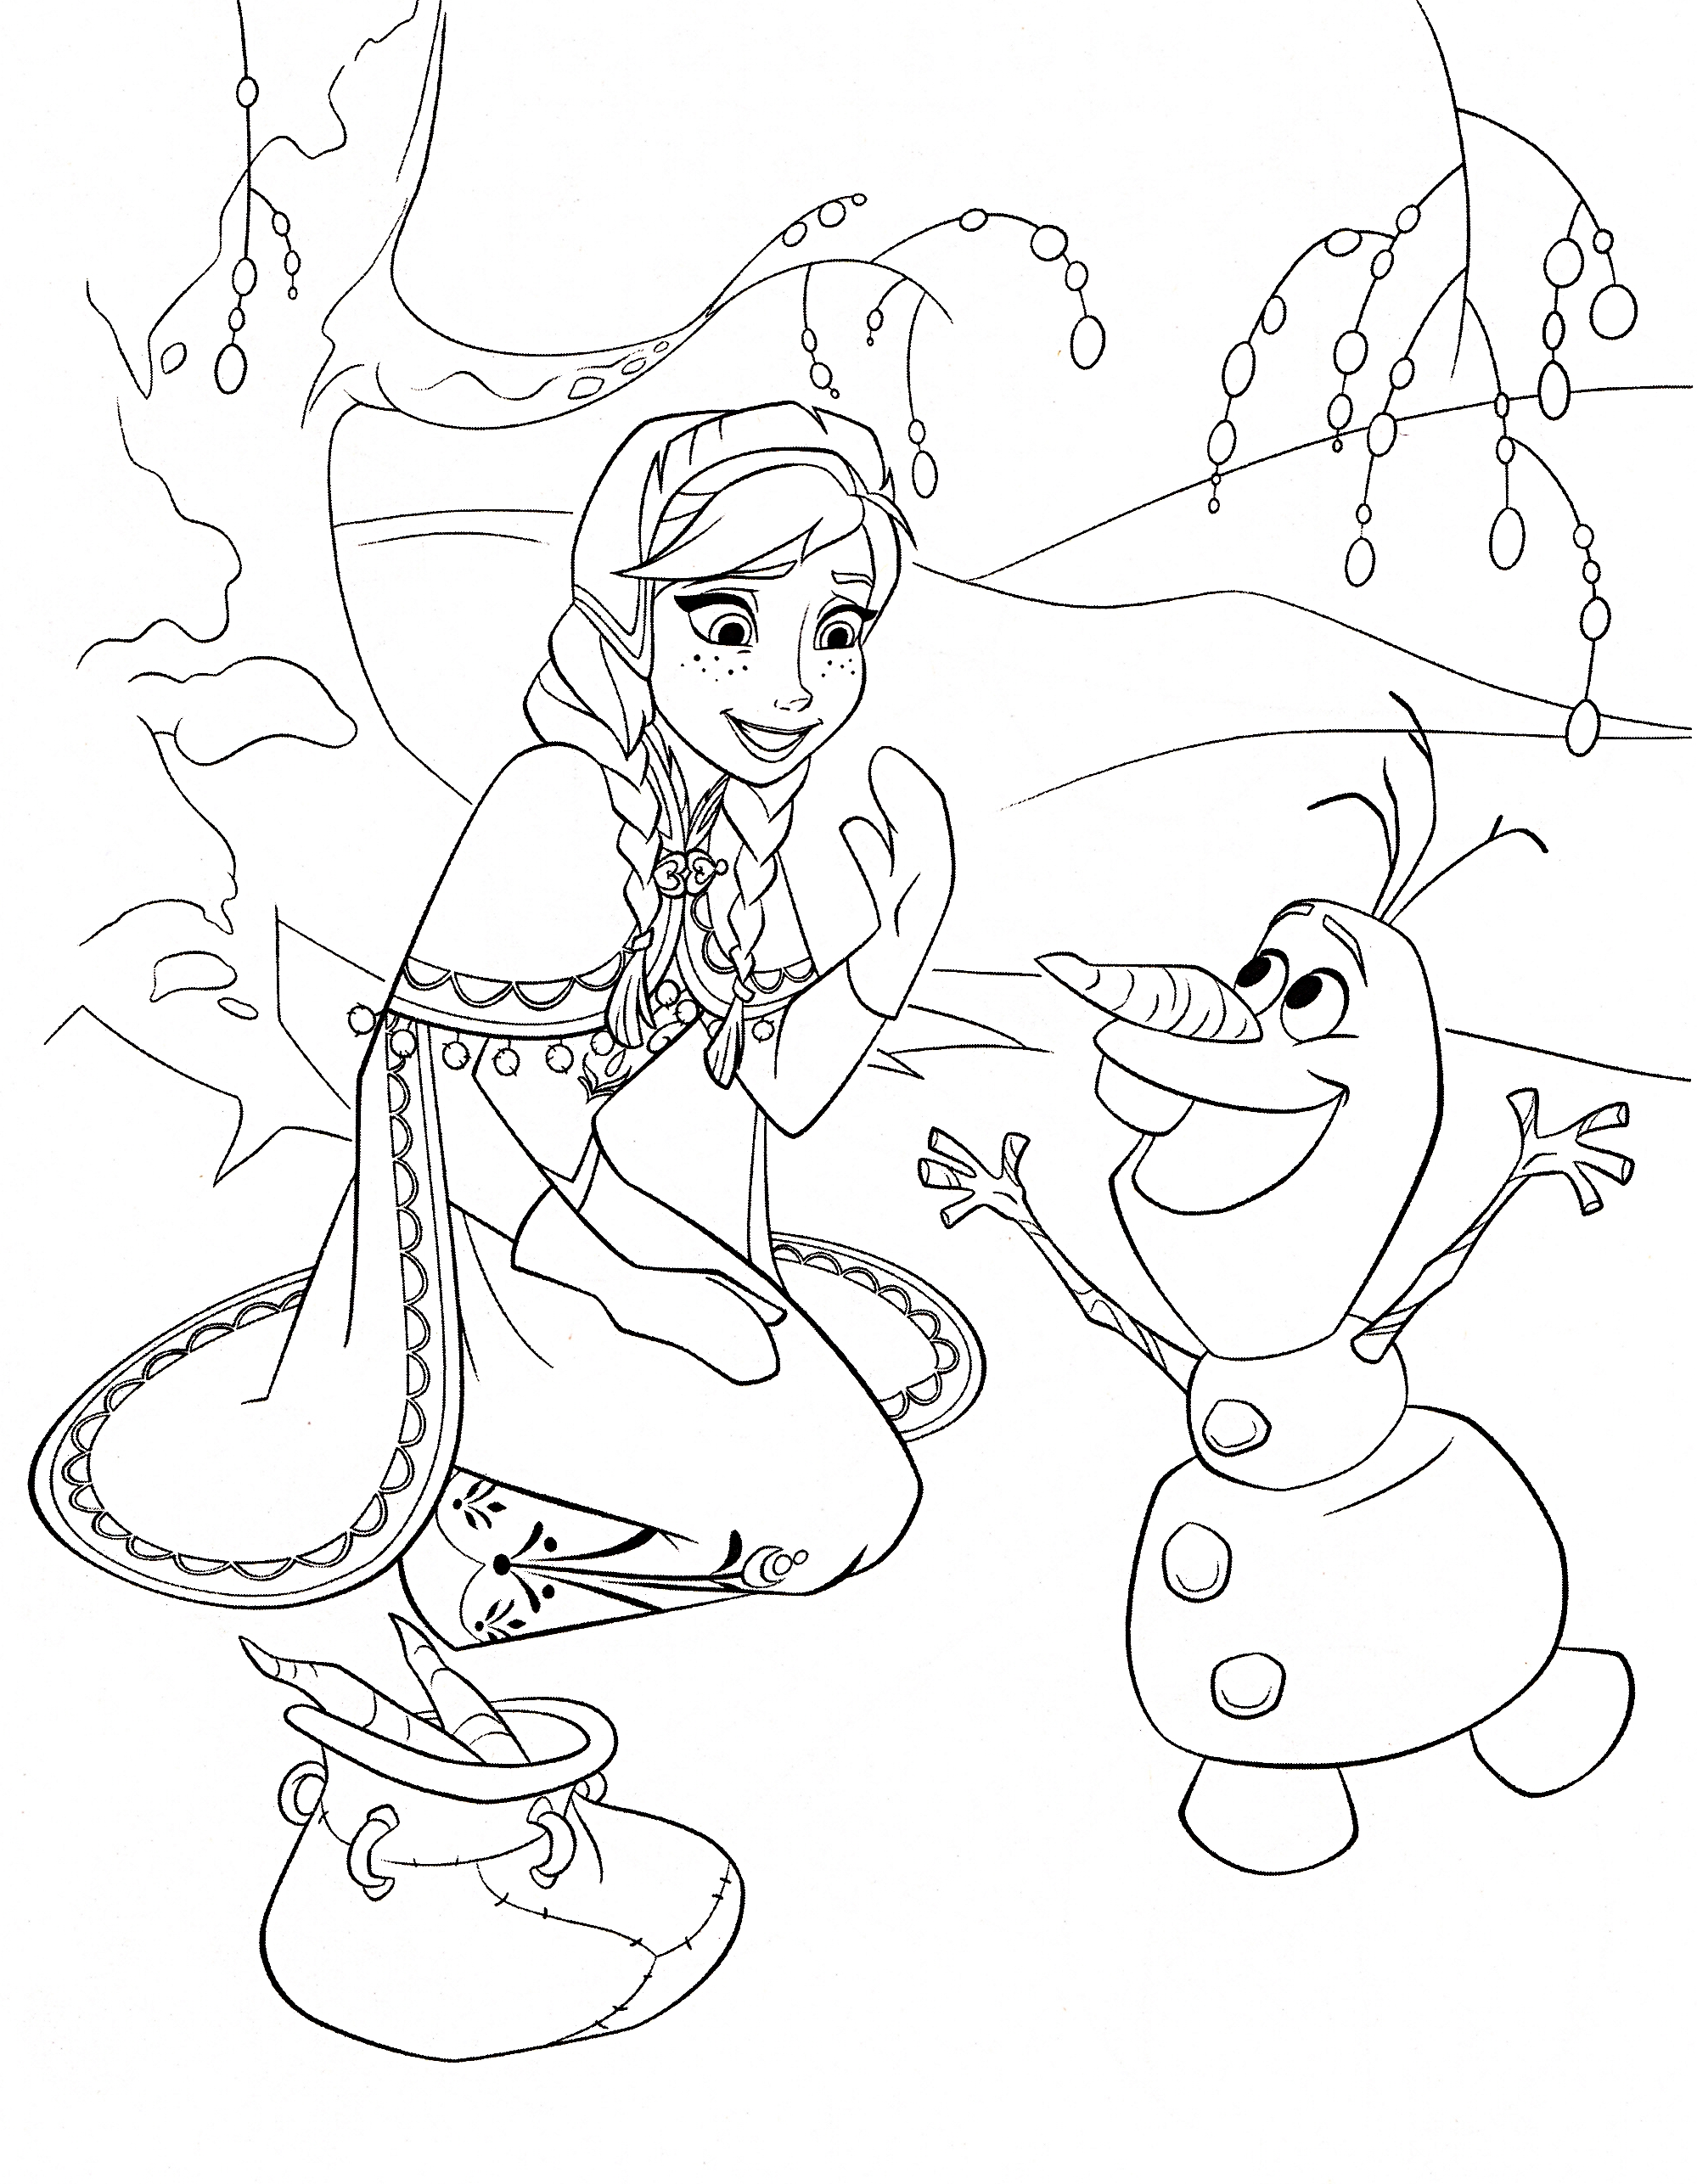 Walt Disney Coloring Pages - Princess Anna & Olaf - Walt ...